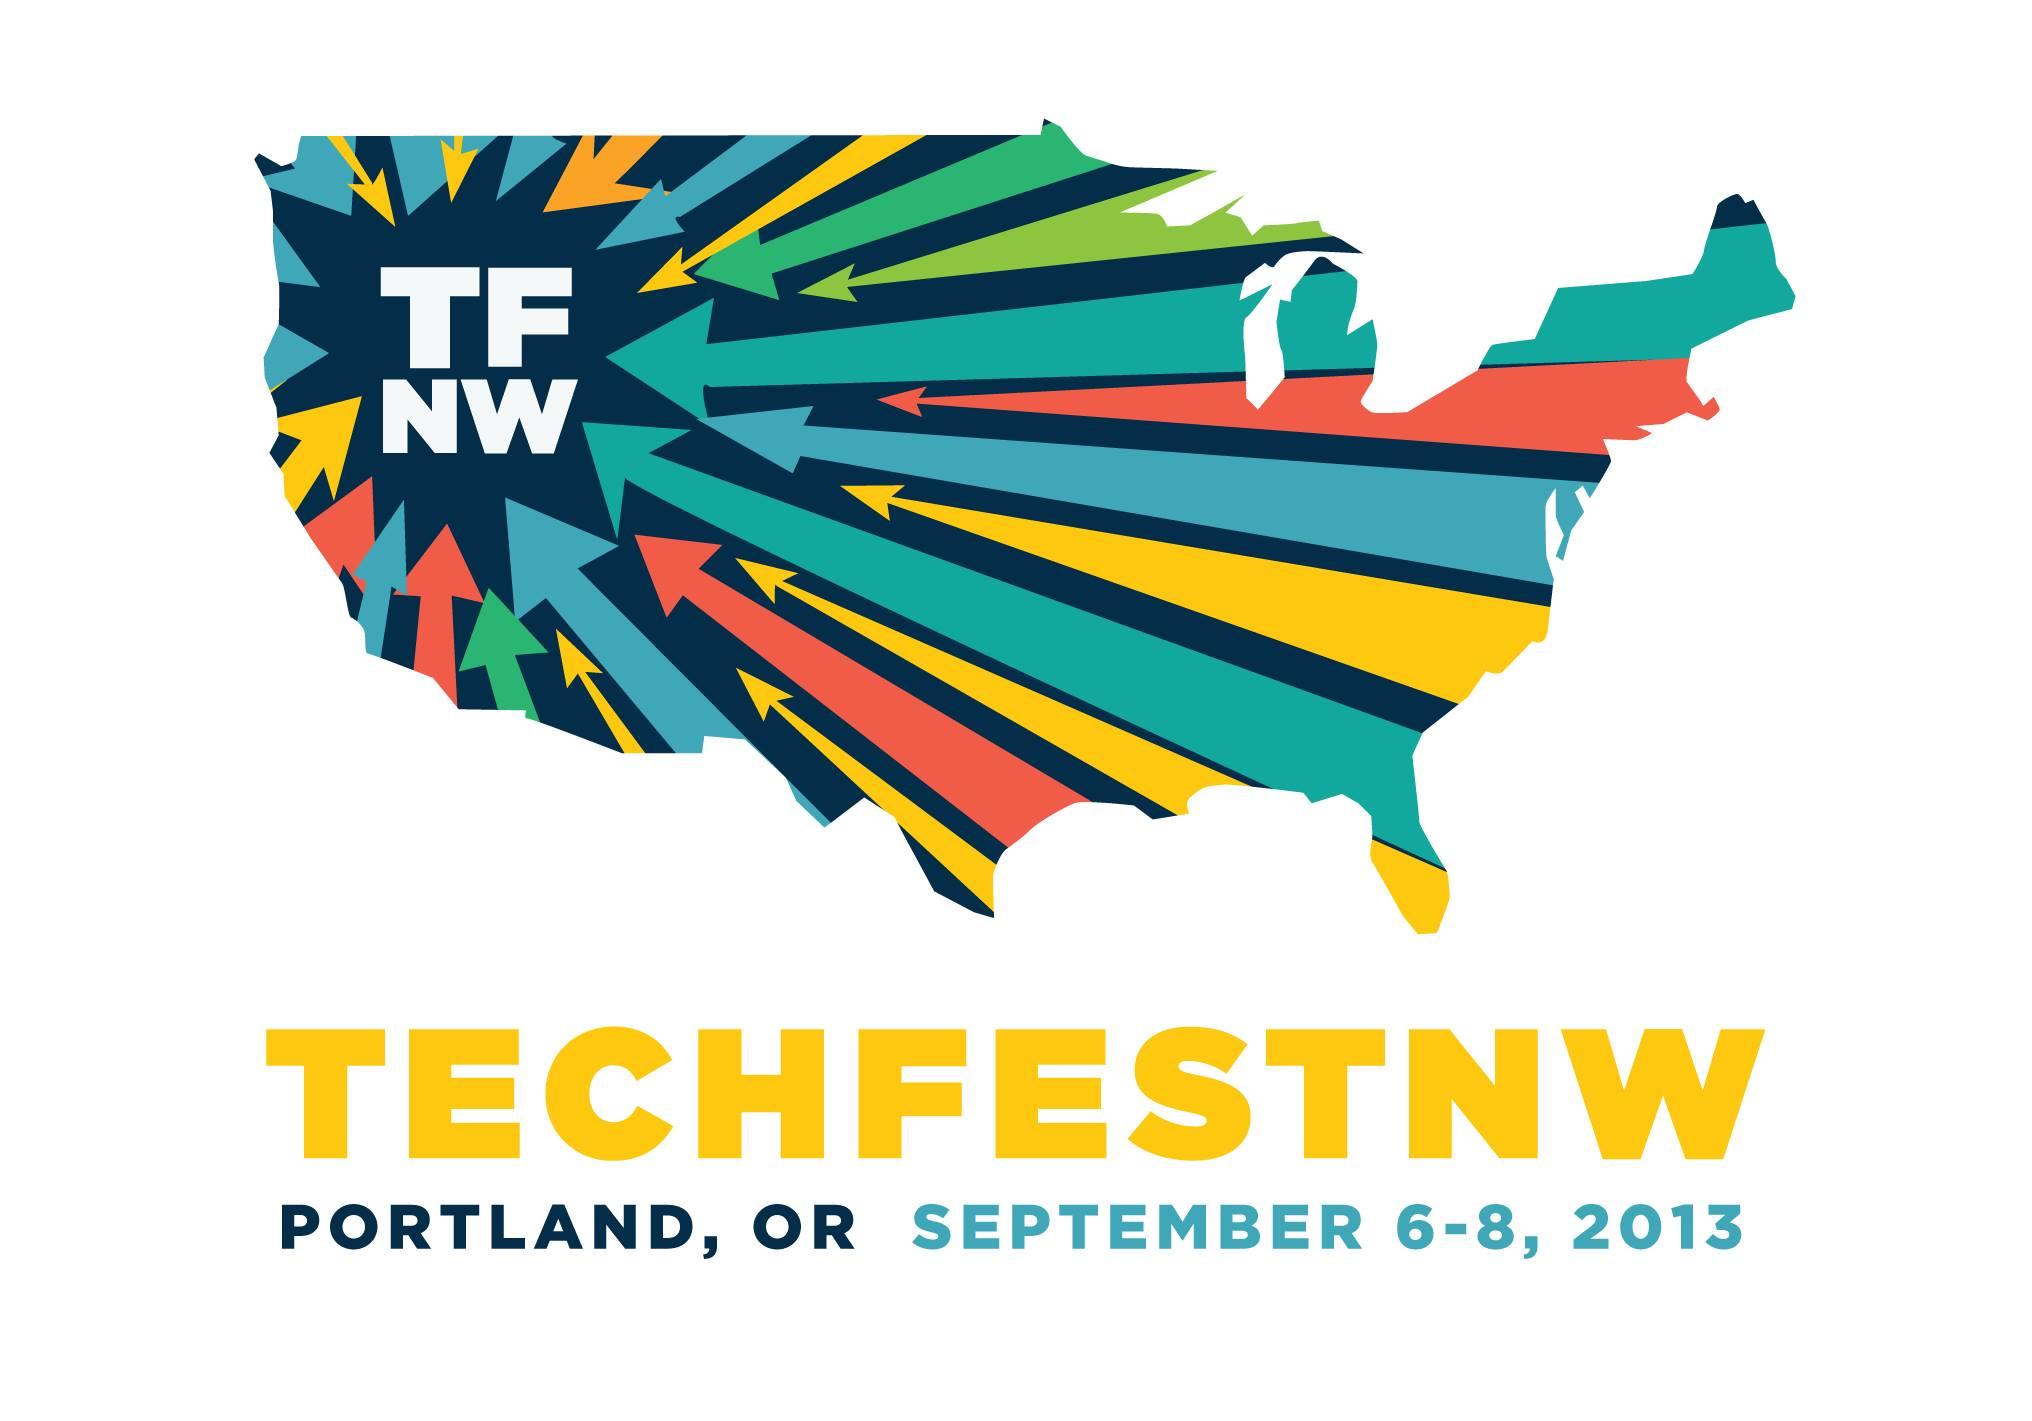 TechfestNW-Portland-Oregon-Sept-2013